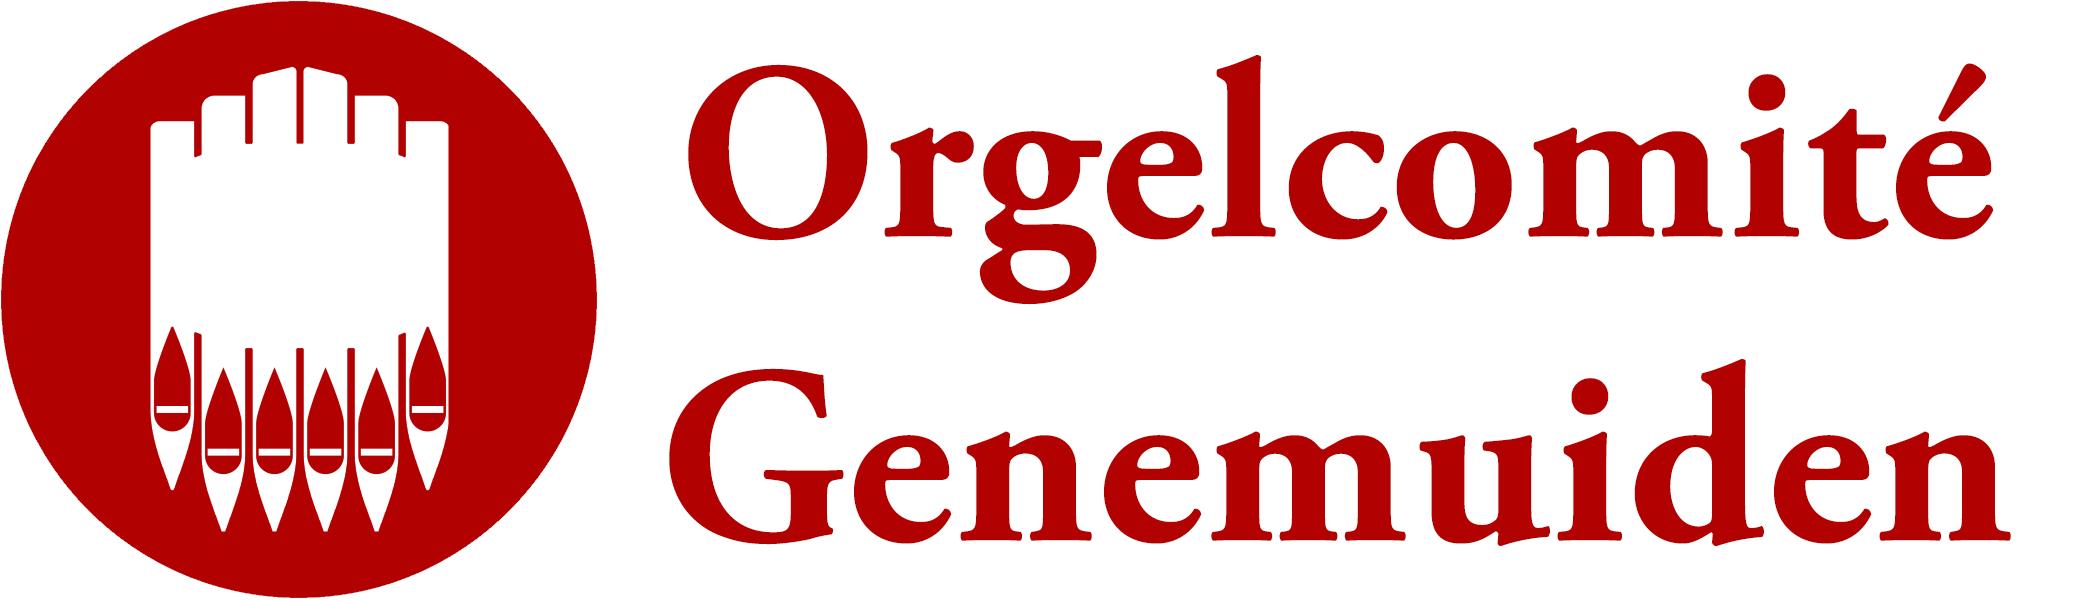 Orgelcomite Genemuiden